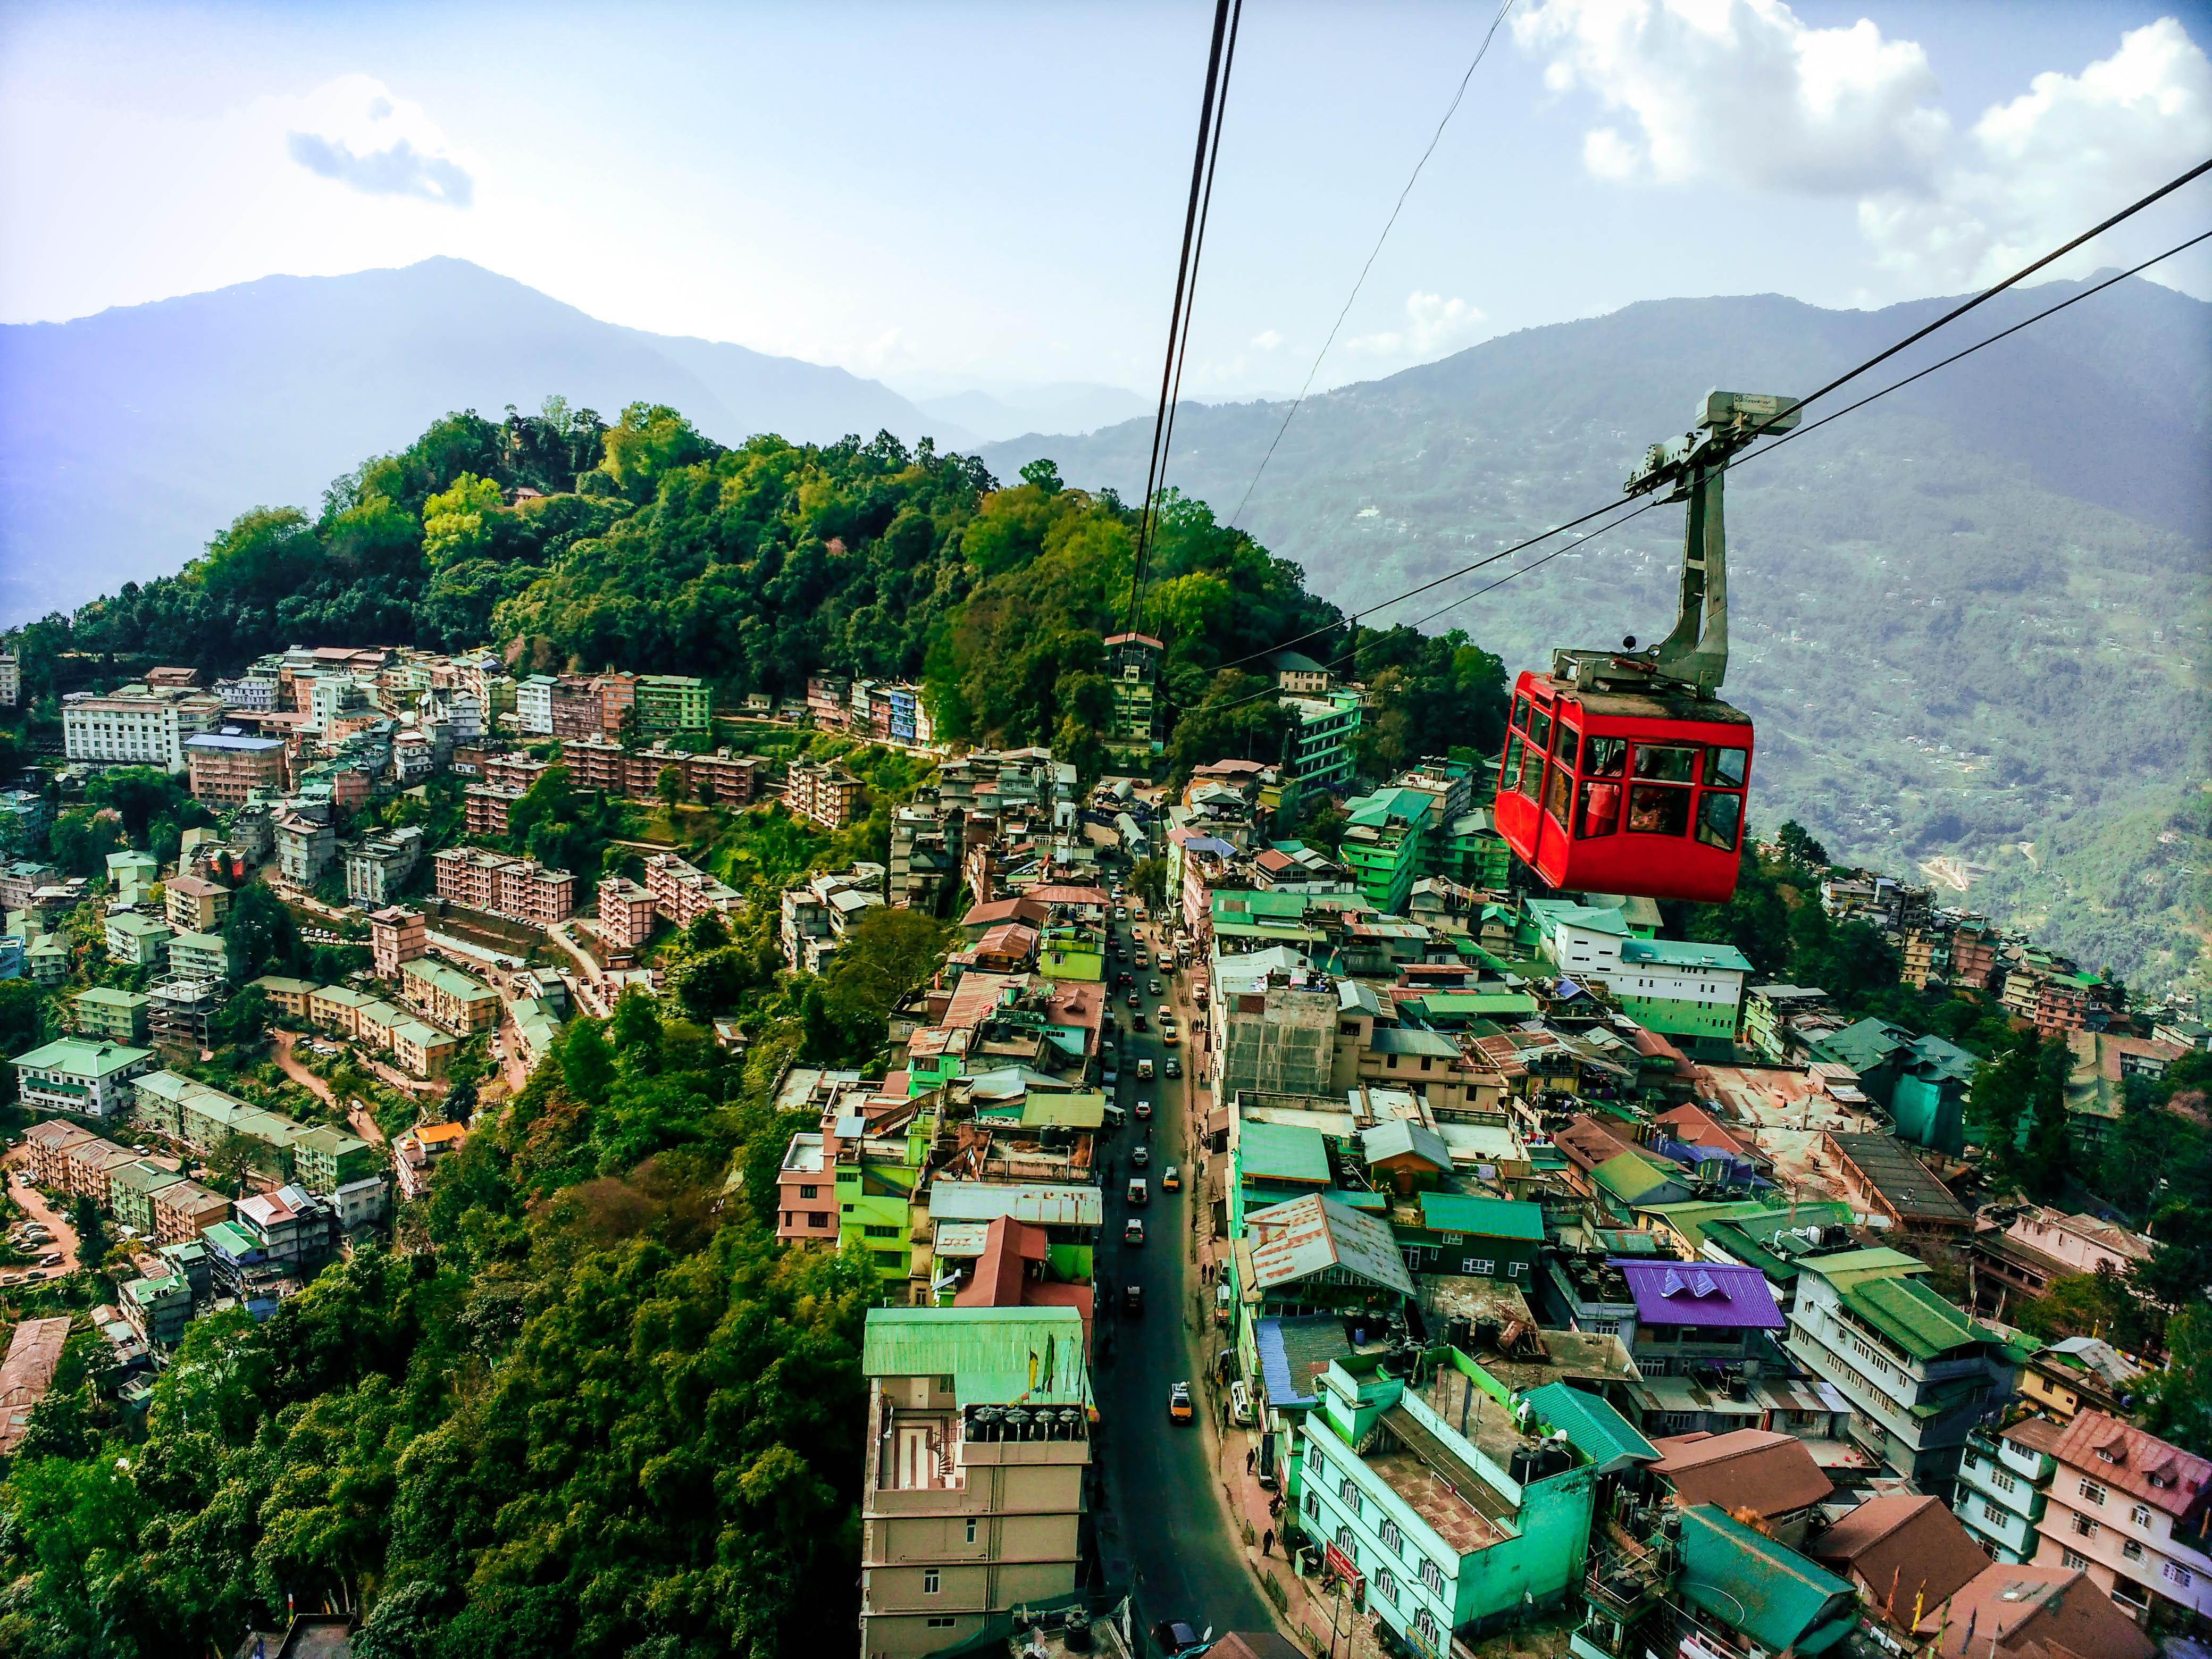 Gangtok, Sikkim in June.